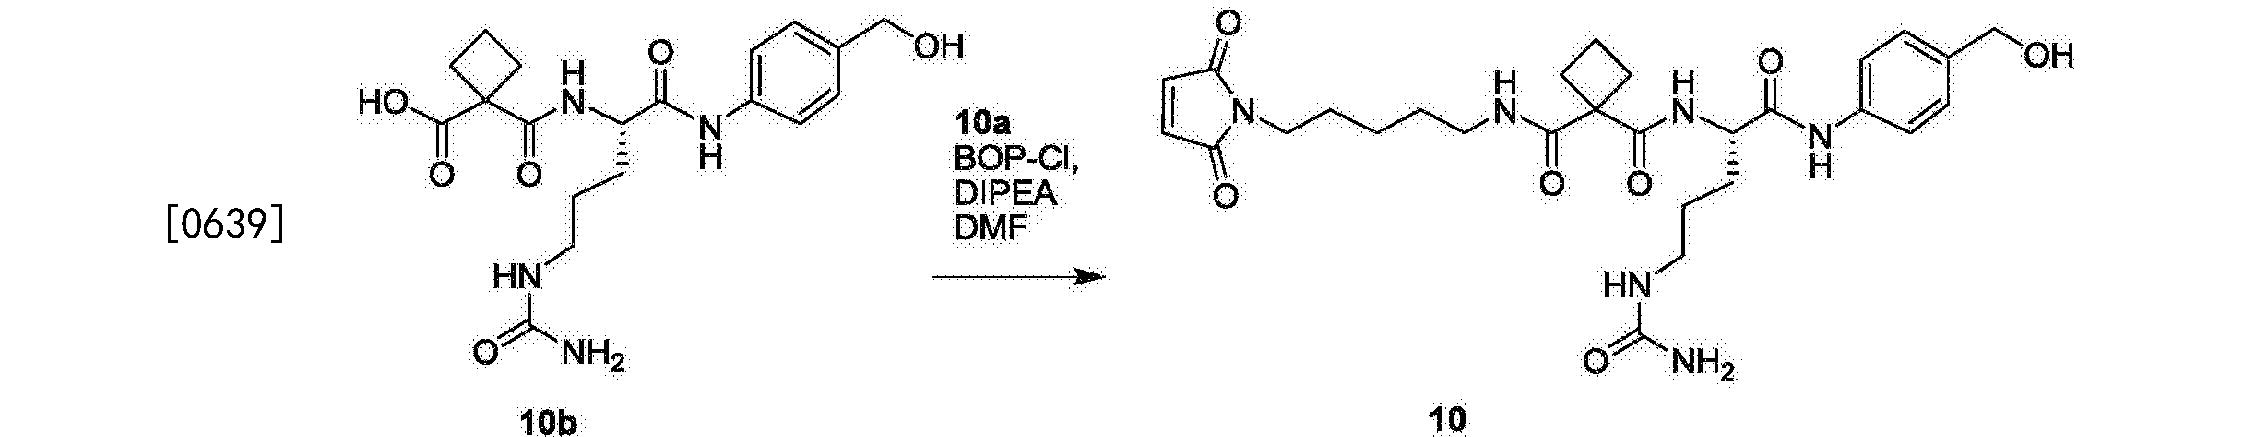 CN107206102A - Anti-staphylococcus aureus antibody rifamycin